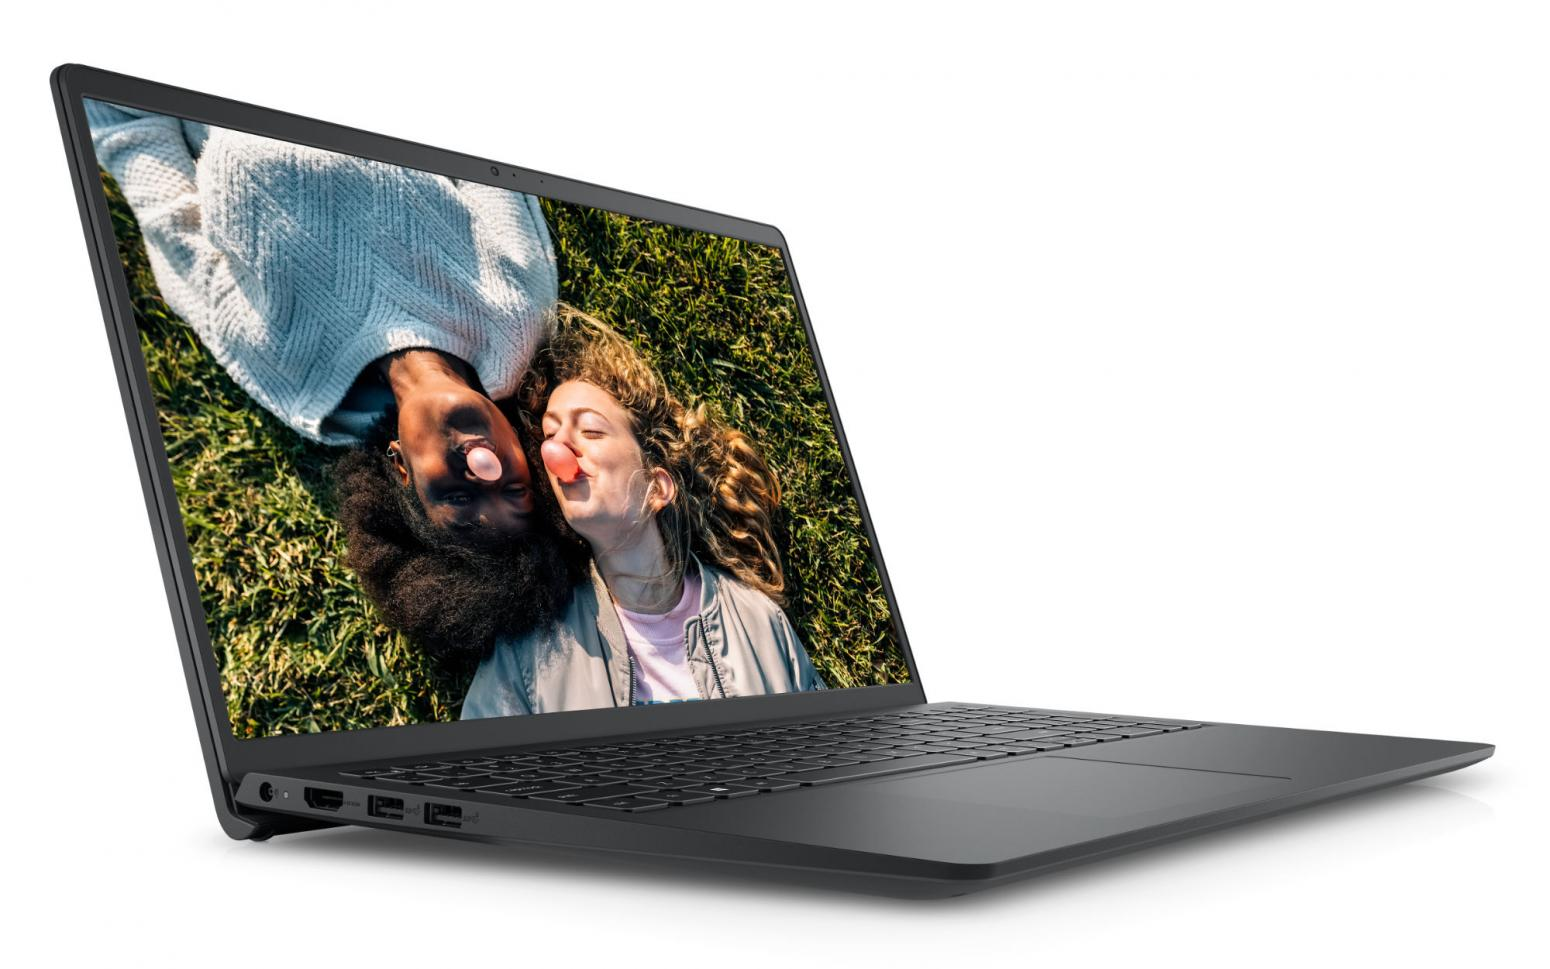 Ordinateur portable Dell Inspiron 15 3511 Noir - i3, Intel G4, SSD 256 Go - photo 2